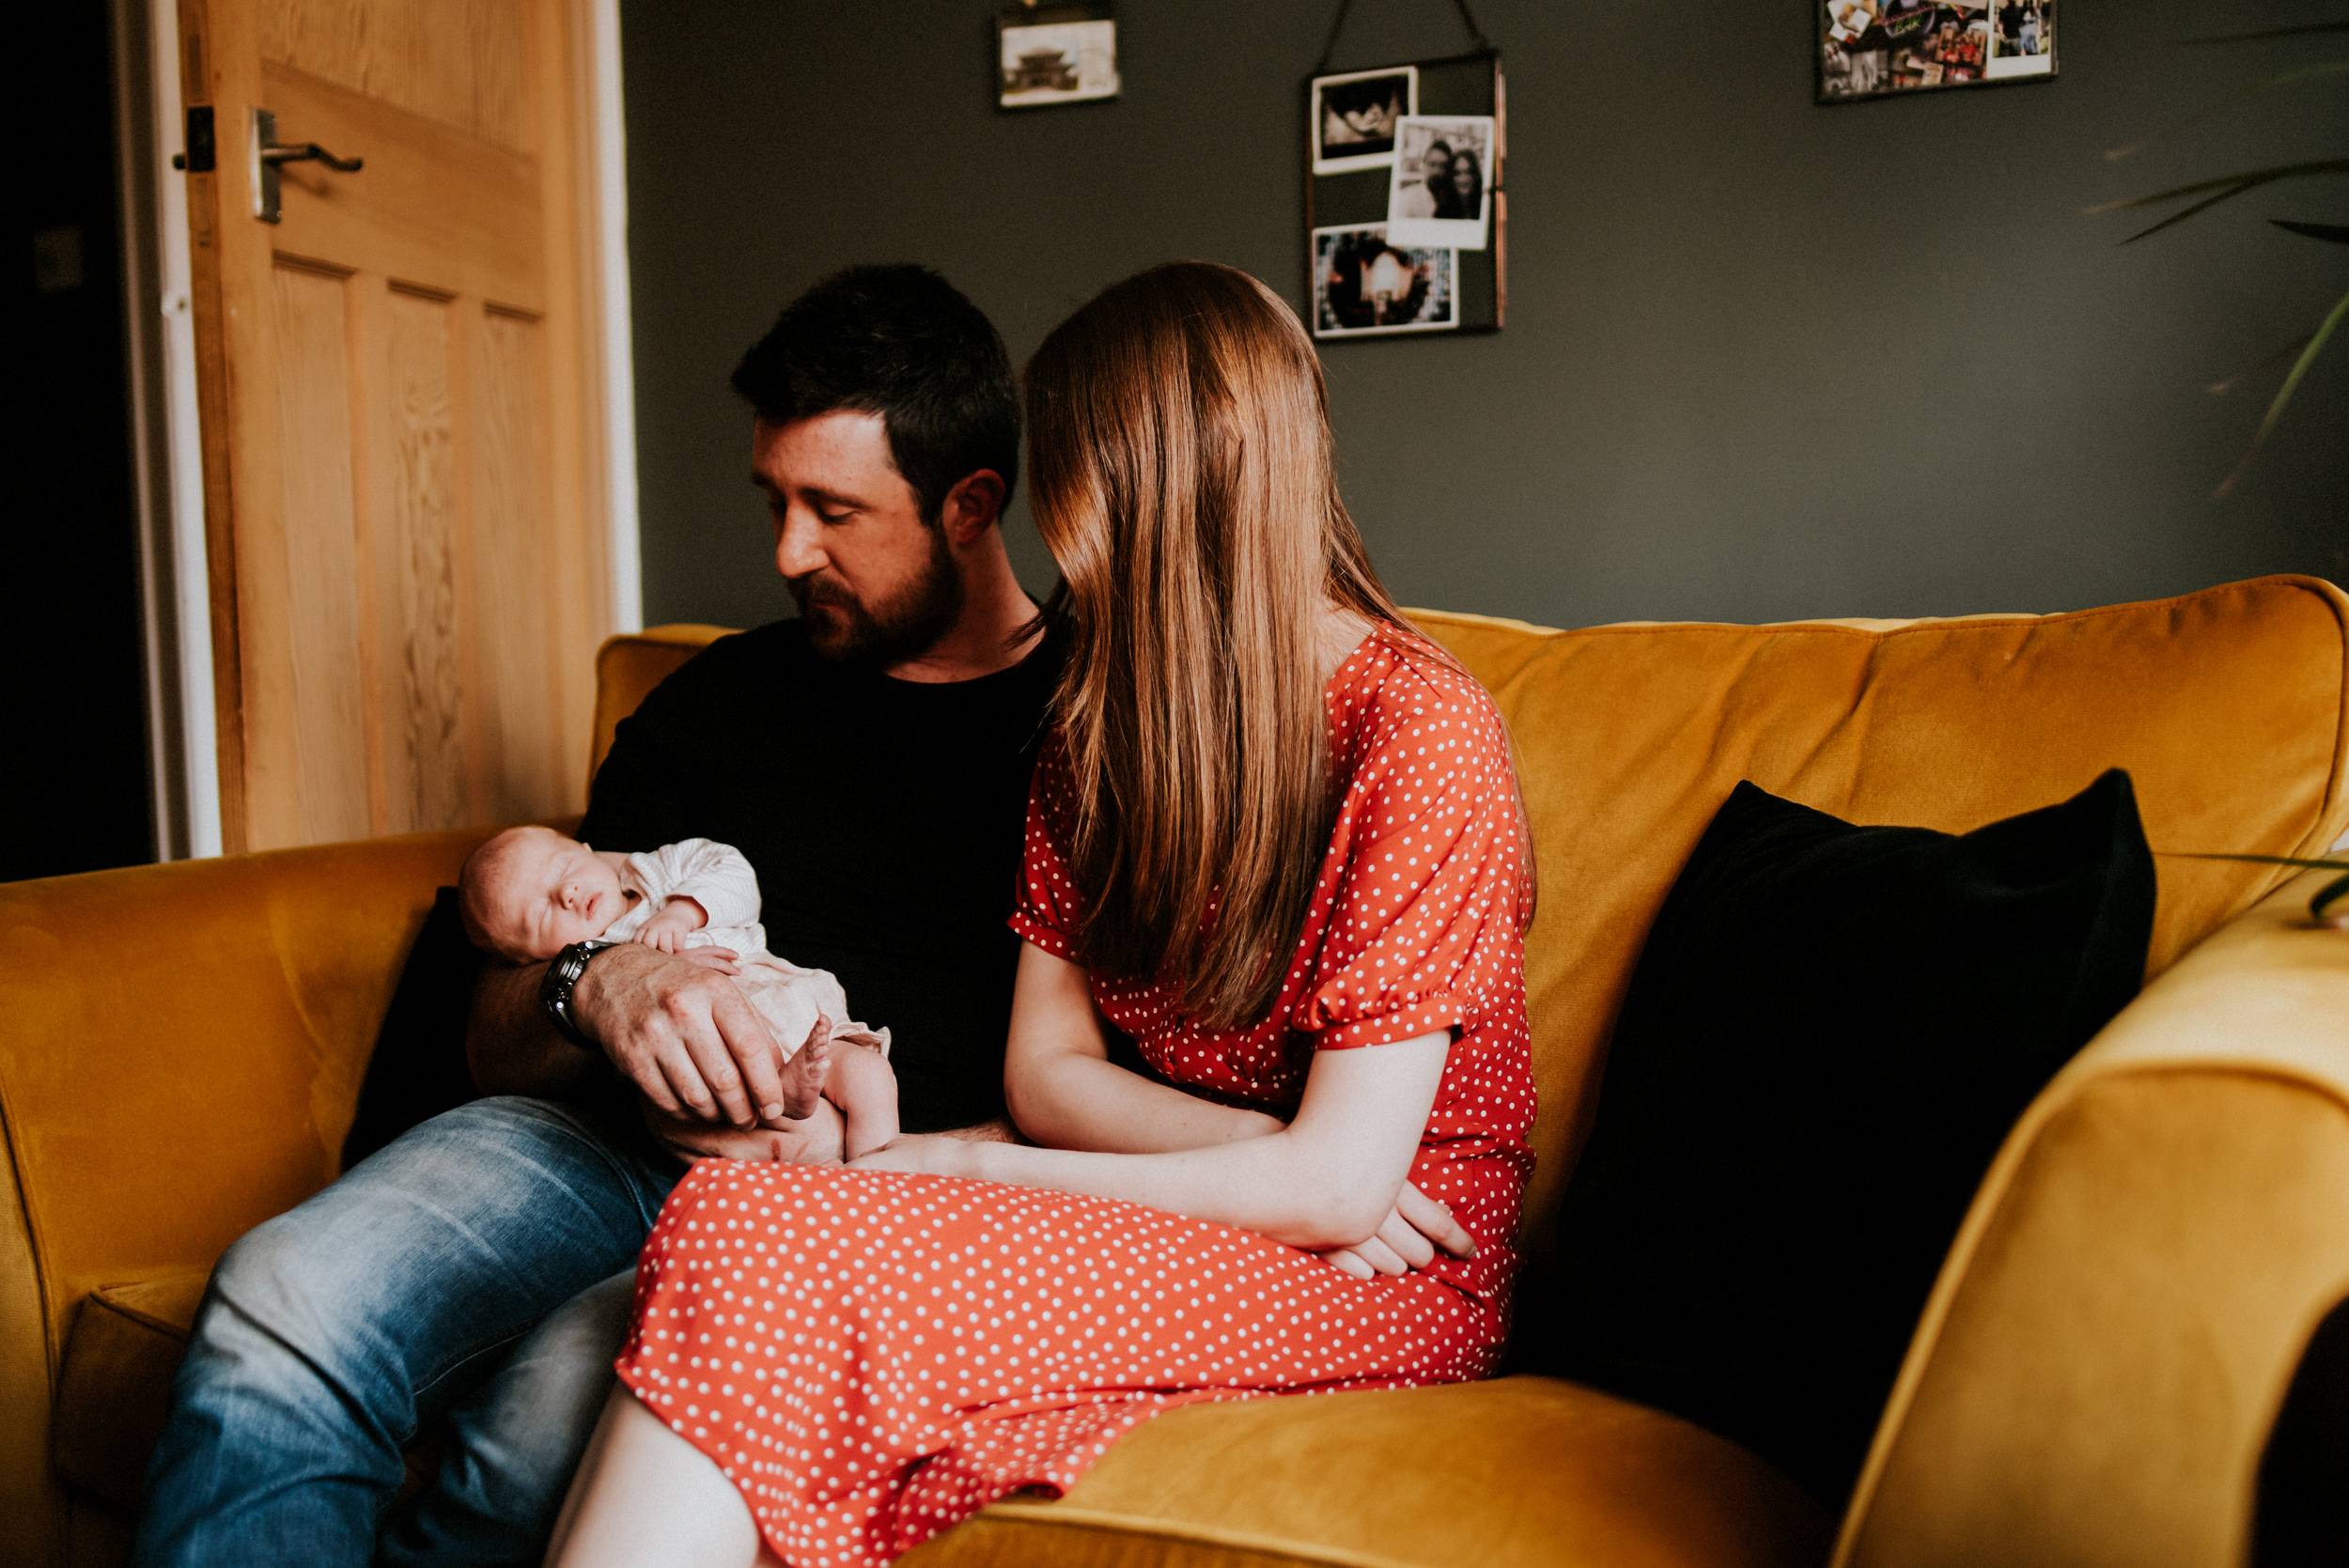 Castleford-Leeds-Newborn-Photographer-Family-Home-Shoot-Shutter-Go-Click-27.jpg